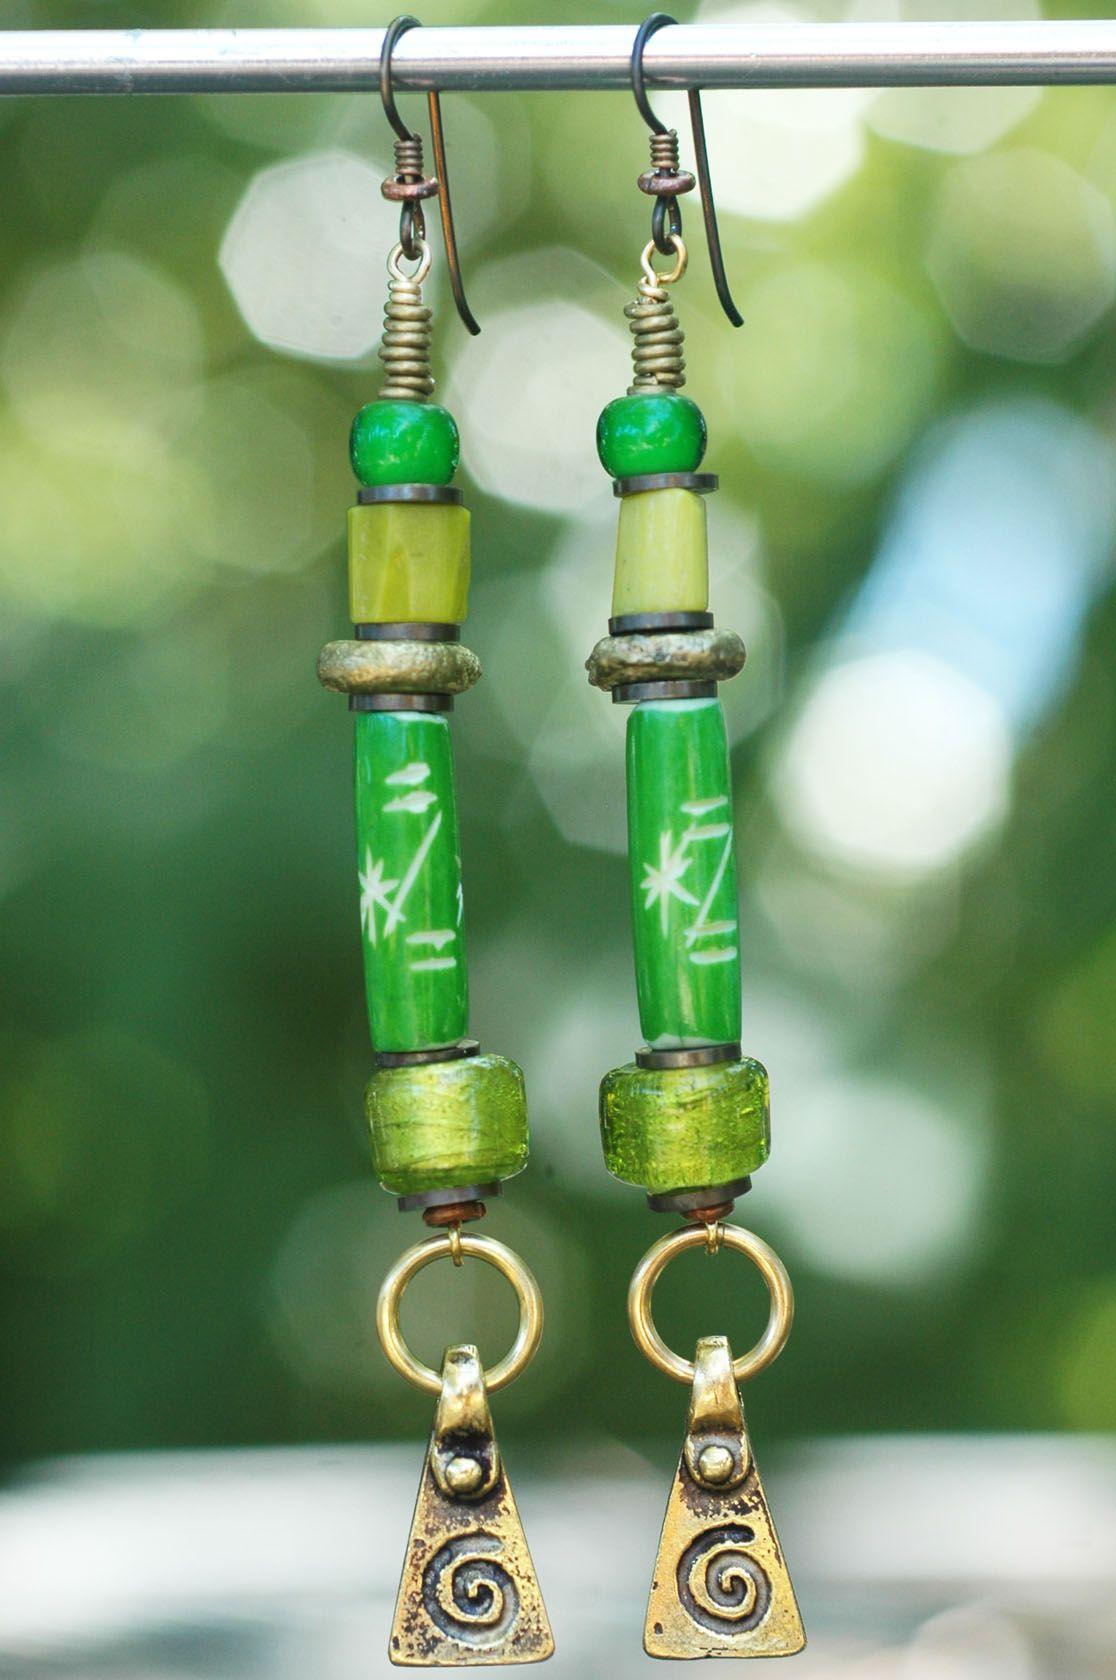 Green Spiral Earrings: Artisan Green Glass and Mixed Metal Spiral Dangle Earrings